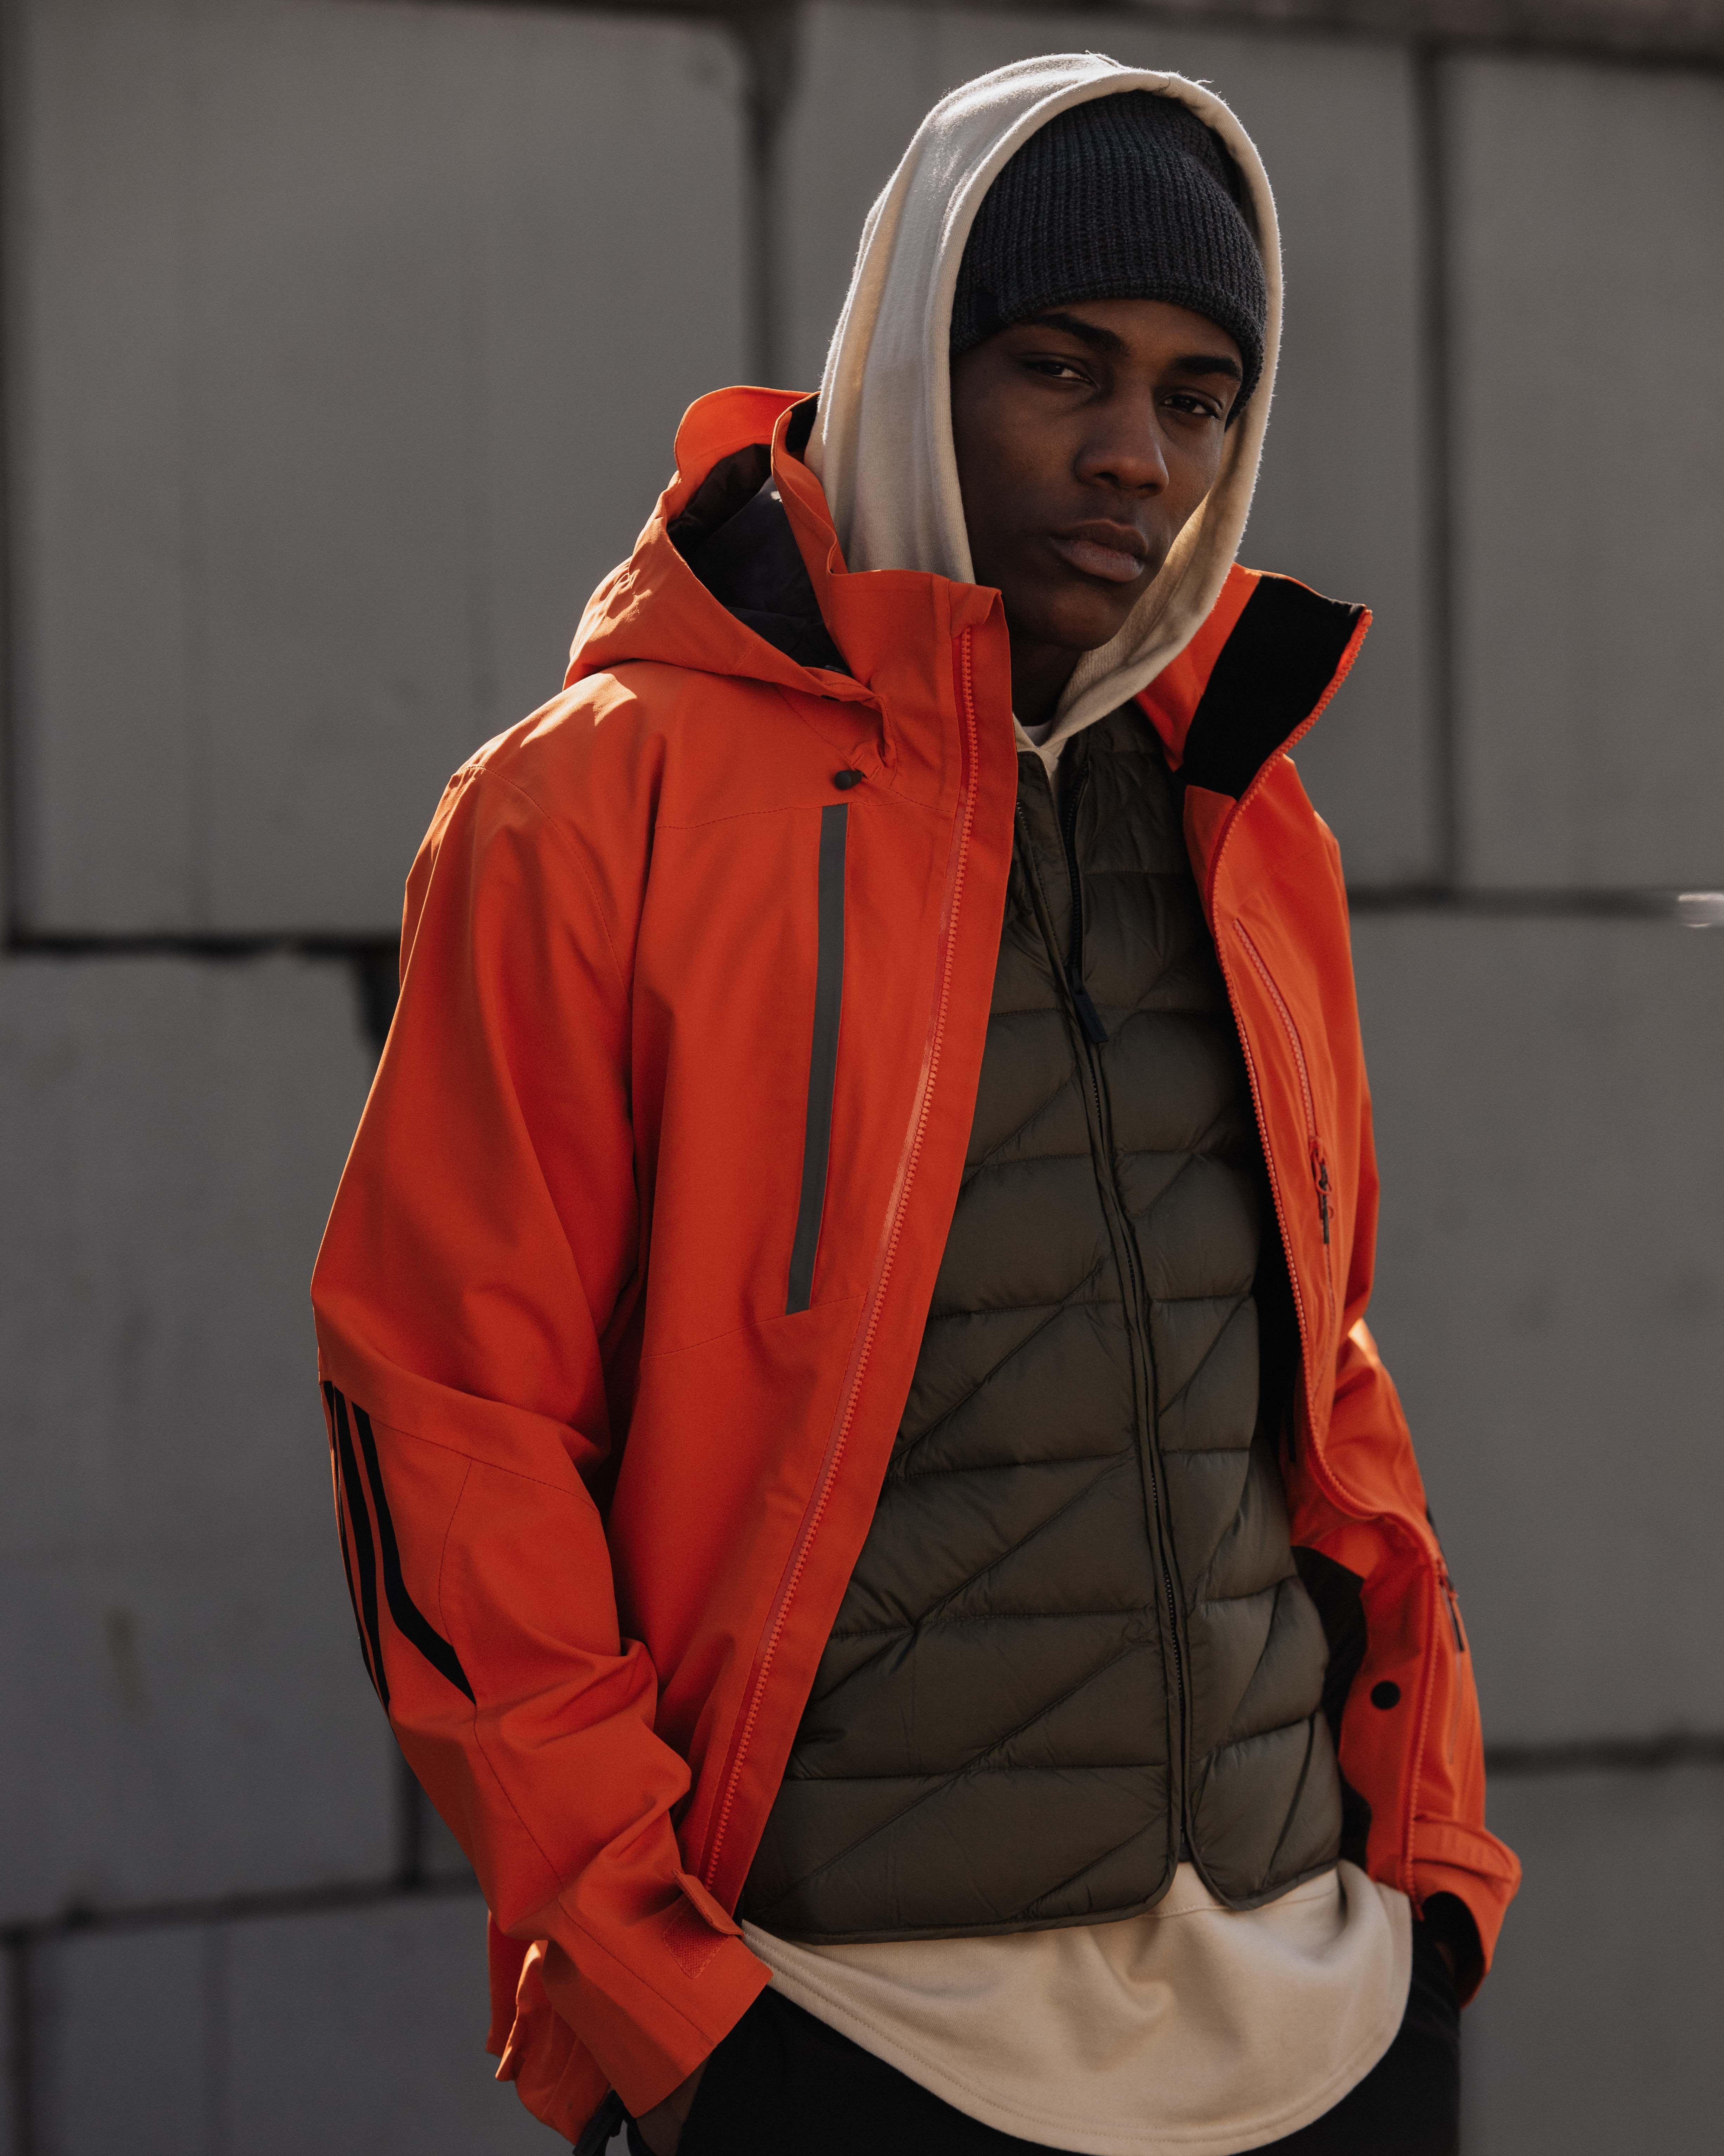 Mens Corkshell Summit Jacket Jackets Hoodies Men Pullover Holden Outerwear [ 6144 x 4912 Pixel ]